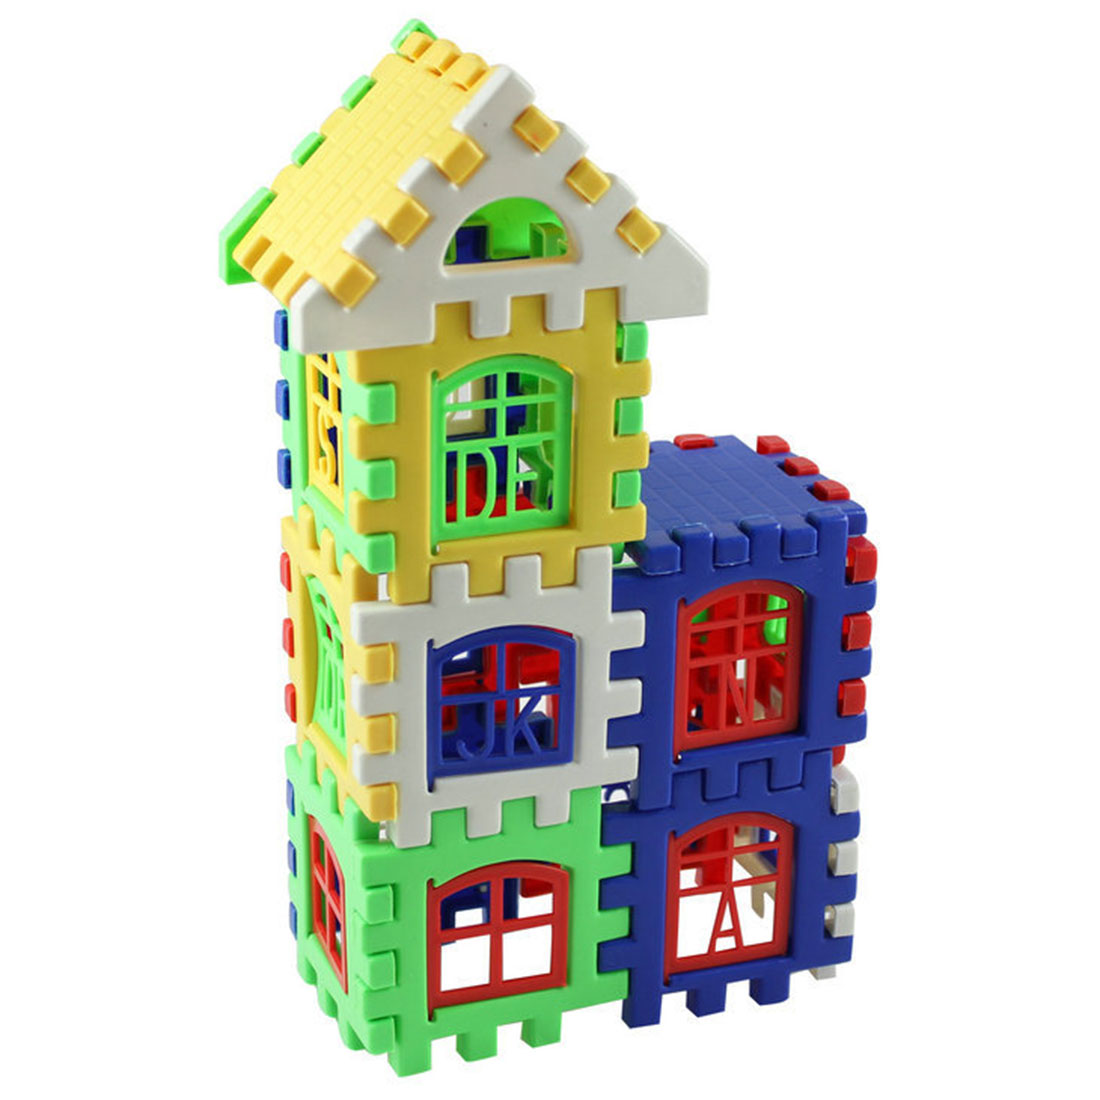 Plastic, Gift, Building, DIY, Set, Learning